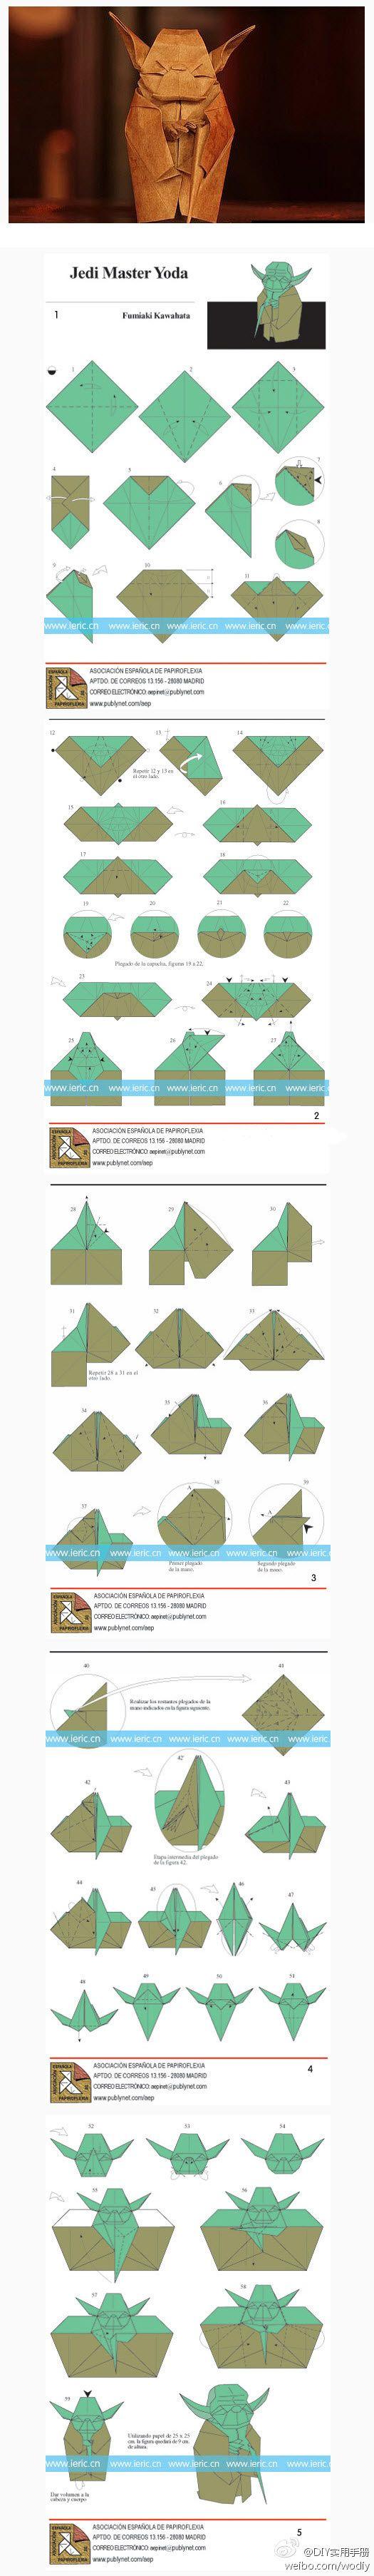 master yoda origami                                                                                                                                                      More